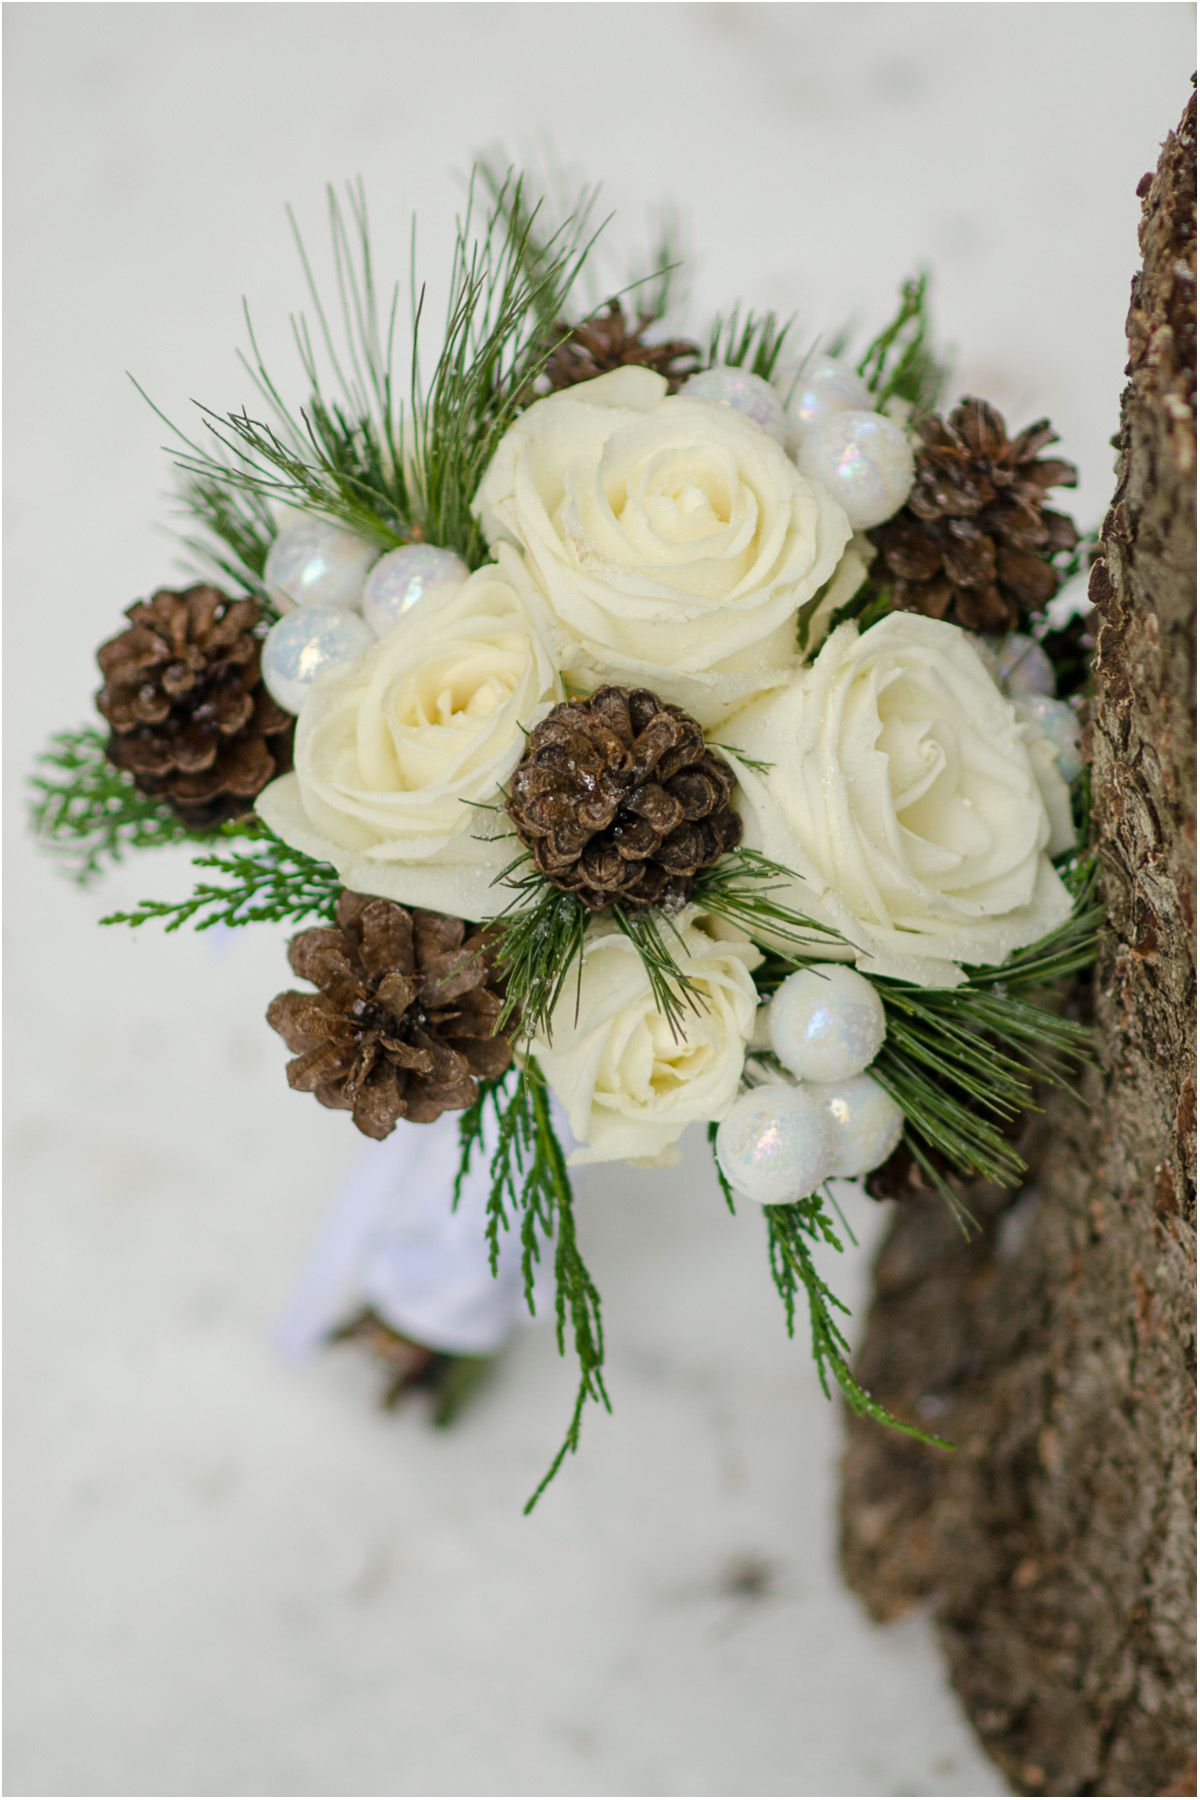 Rustic Winter Wedding Styled Shoot